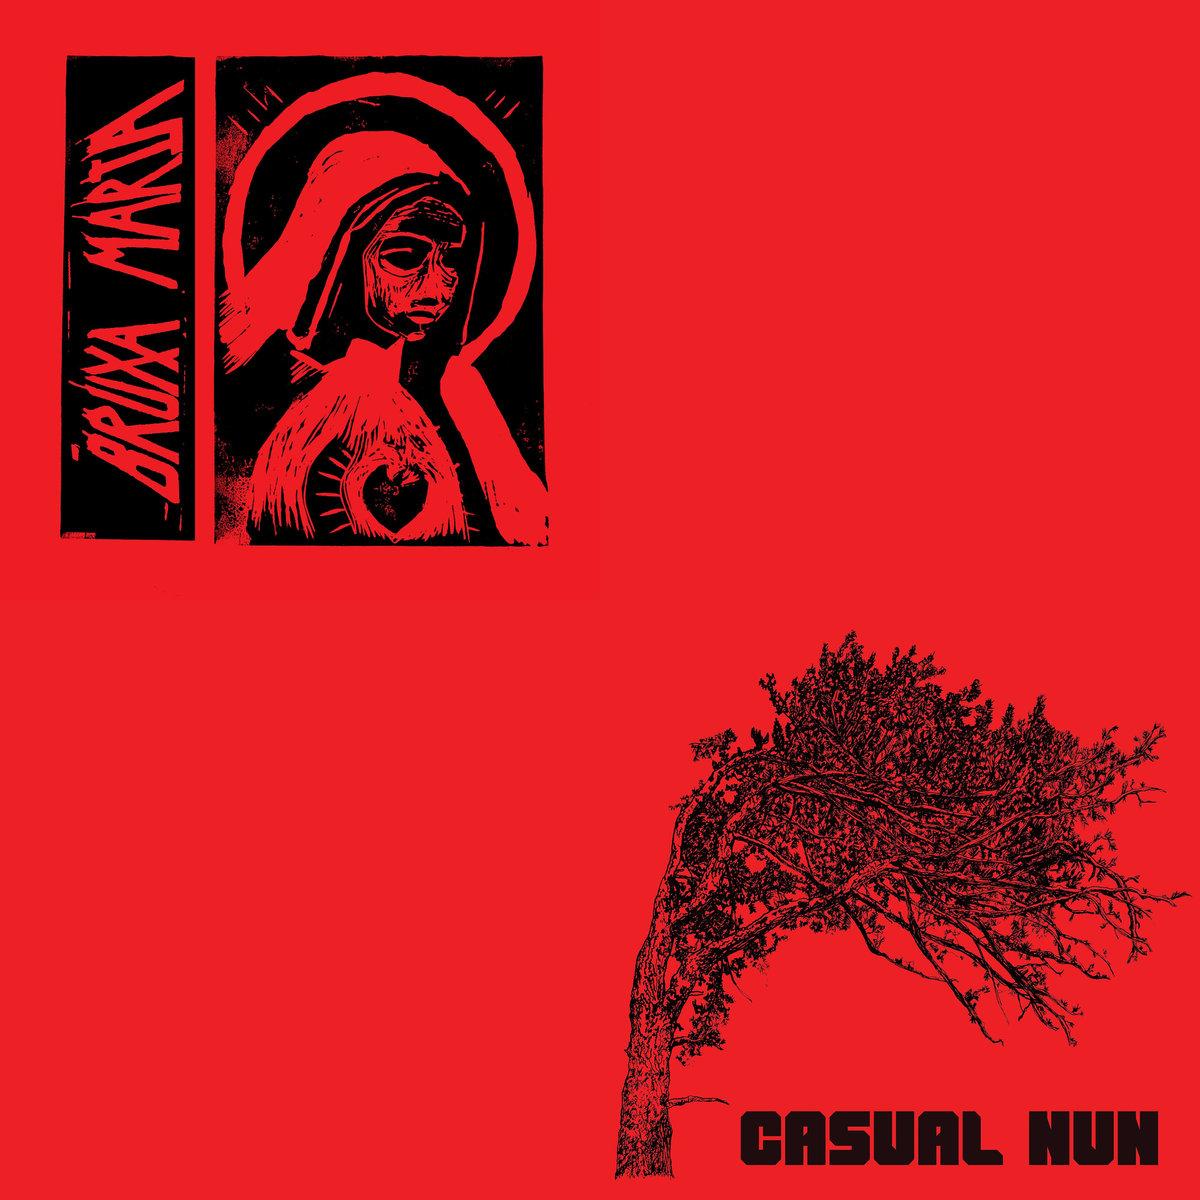 BRUXA MARIA / CASUAL NUN Split – Vinyl LP (black) * Pre-order